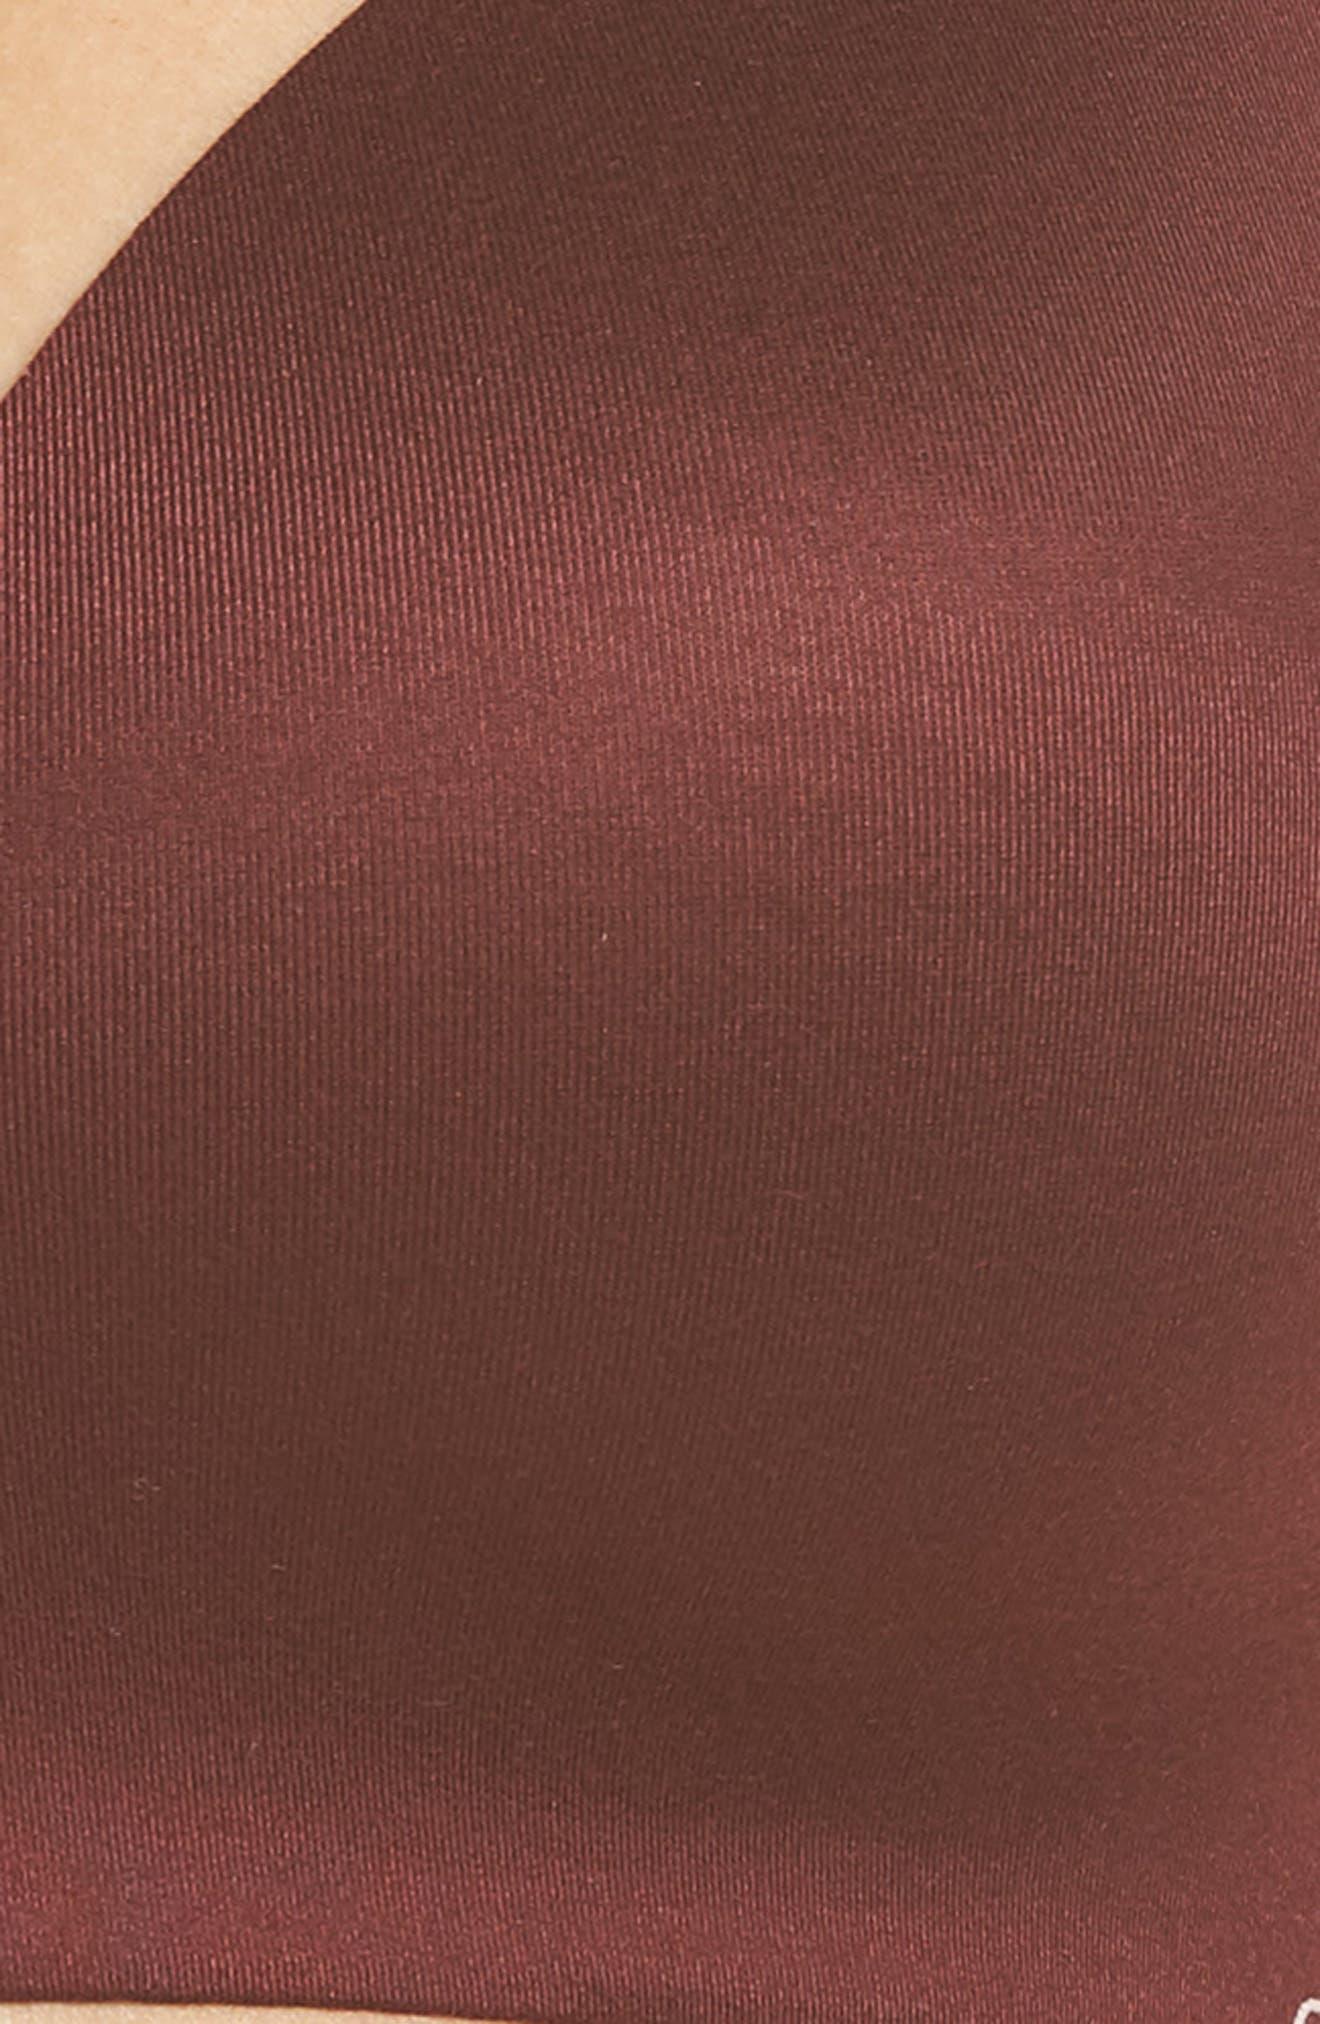 CALVIN KLEIN, Soft Cup Bra, Alternate thumbnail 7, color, 930